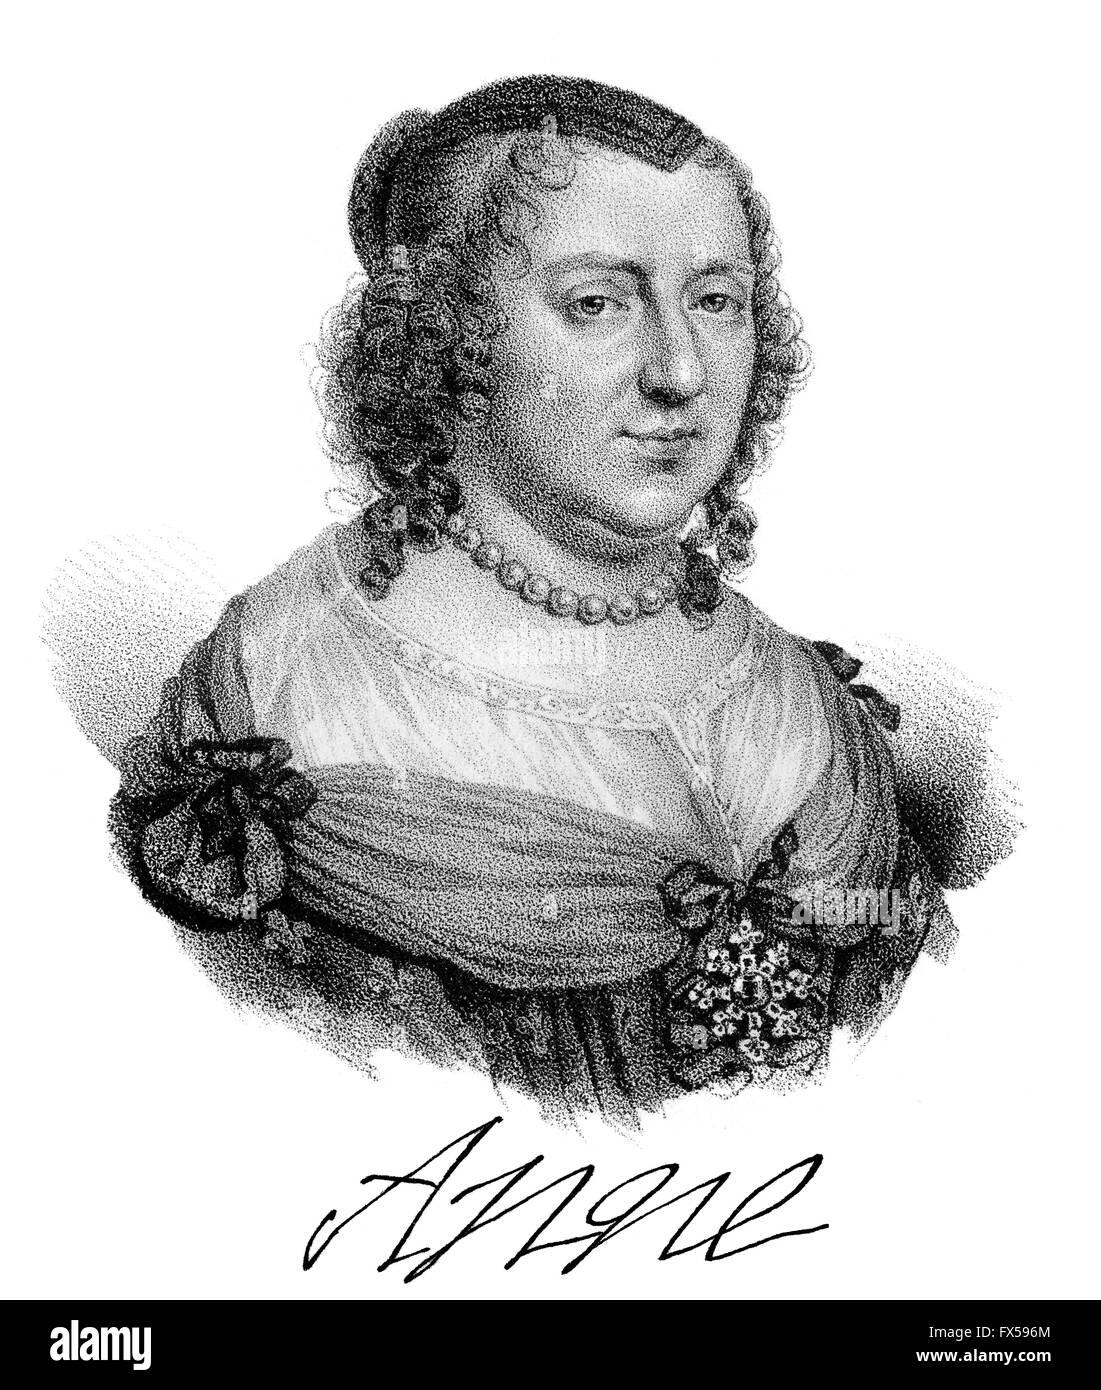 Anne of Austria, Anne d'Autriche, Anna Maria Mauricia von Spanien, 1601-1666, queen consort of France and Navarre - Stock Image